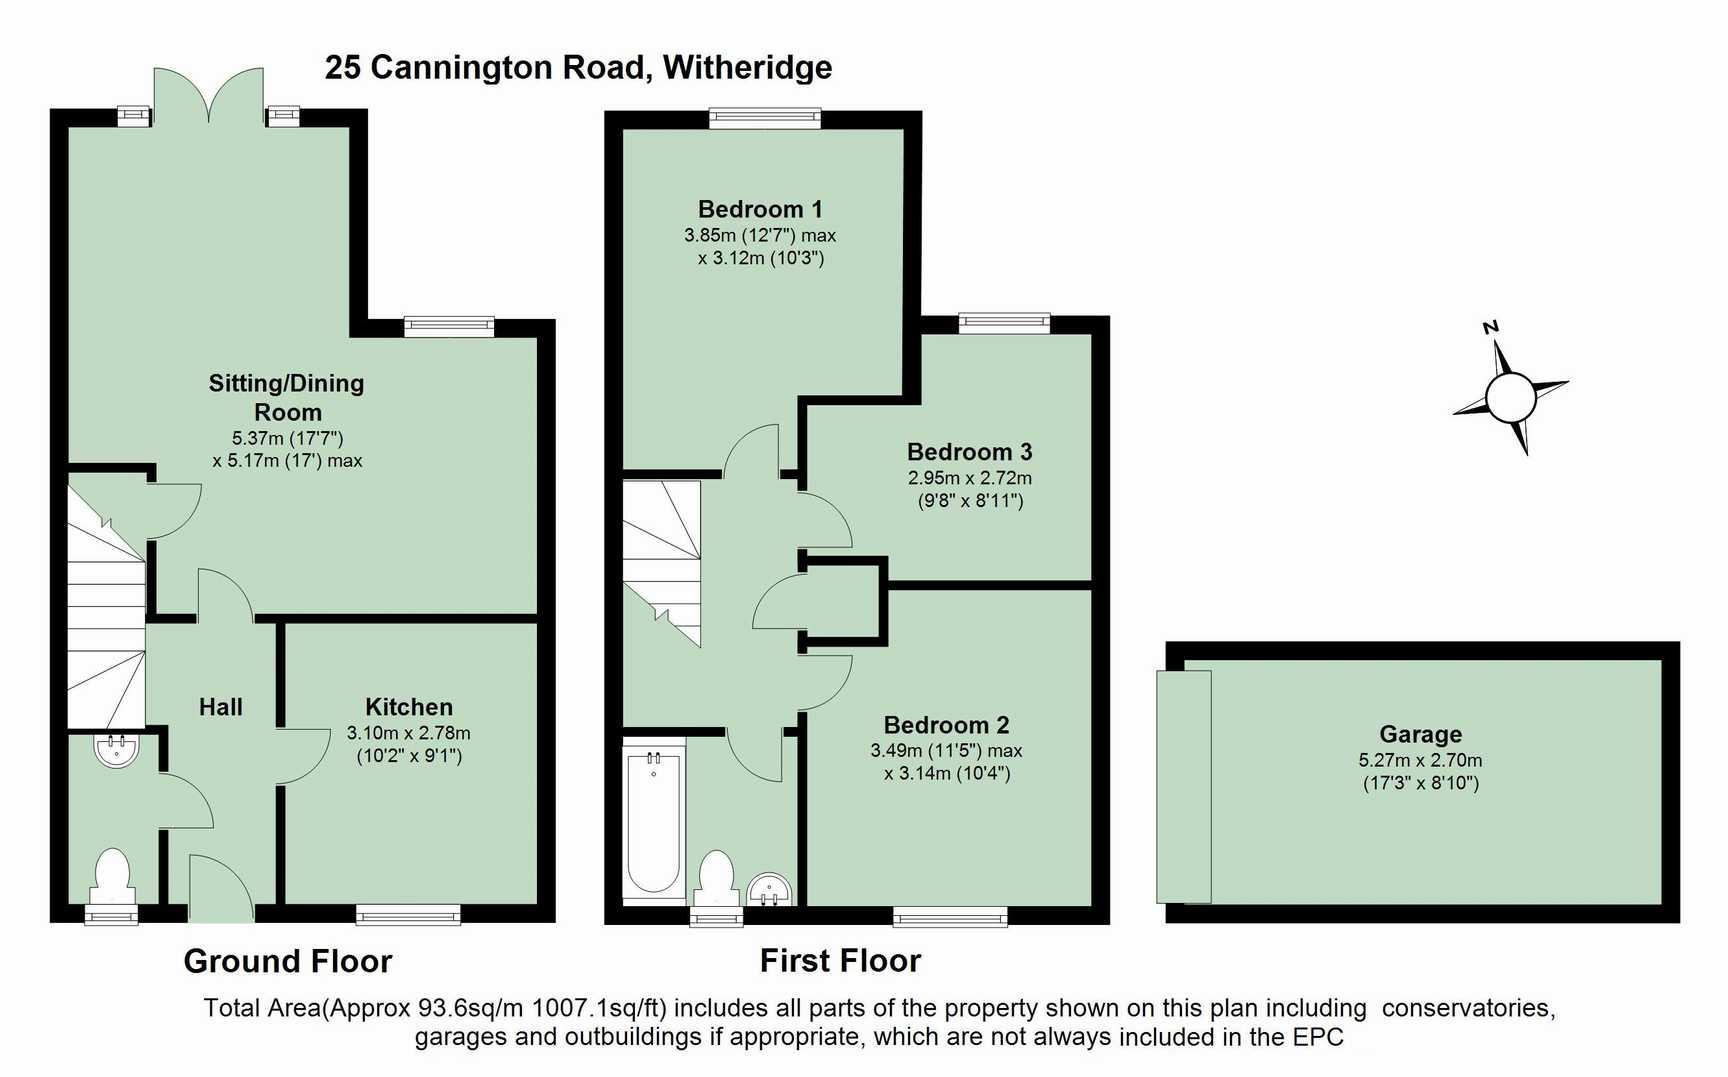 Cannington road witheridge tiverton ex16 3 bedroom semi for Food bar cannington